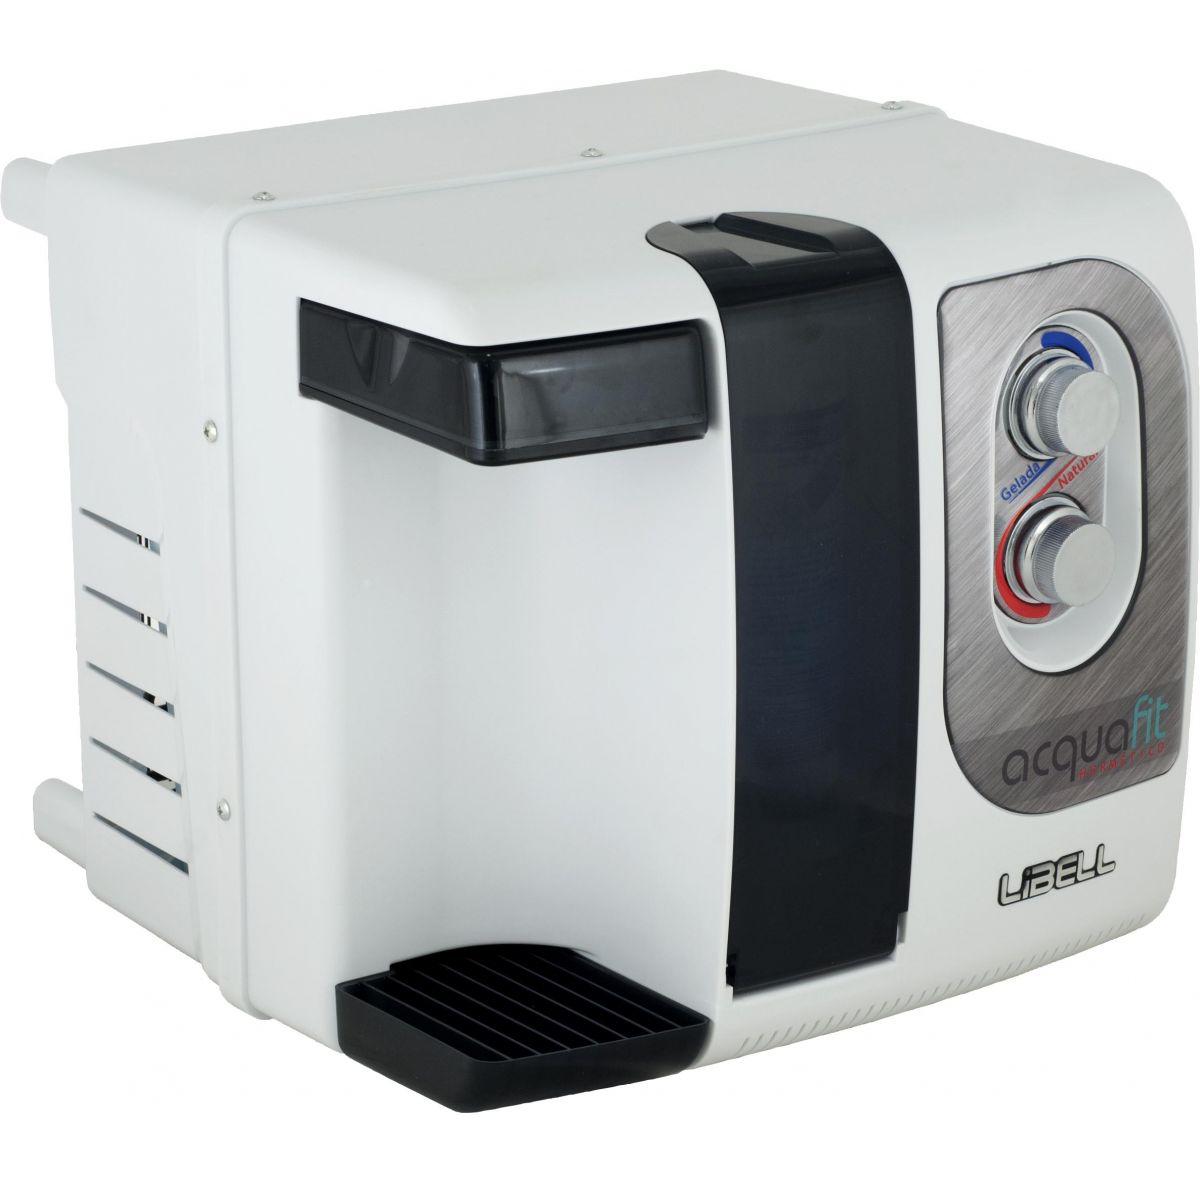 Purificador Hermético Branco Libell Acqua-Fit bivolt Compacto, 3 etapas de filtragem